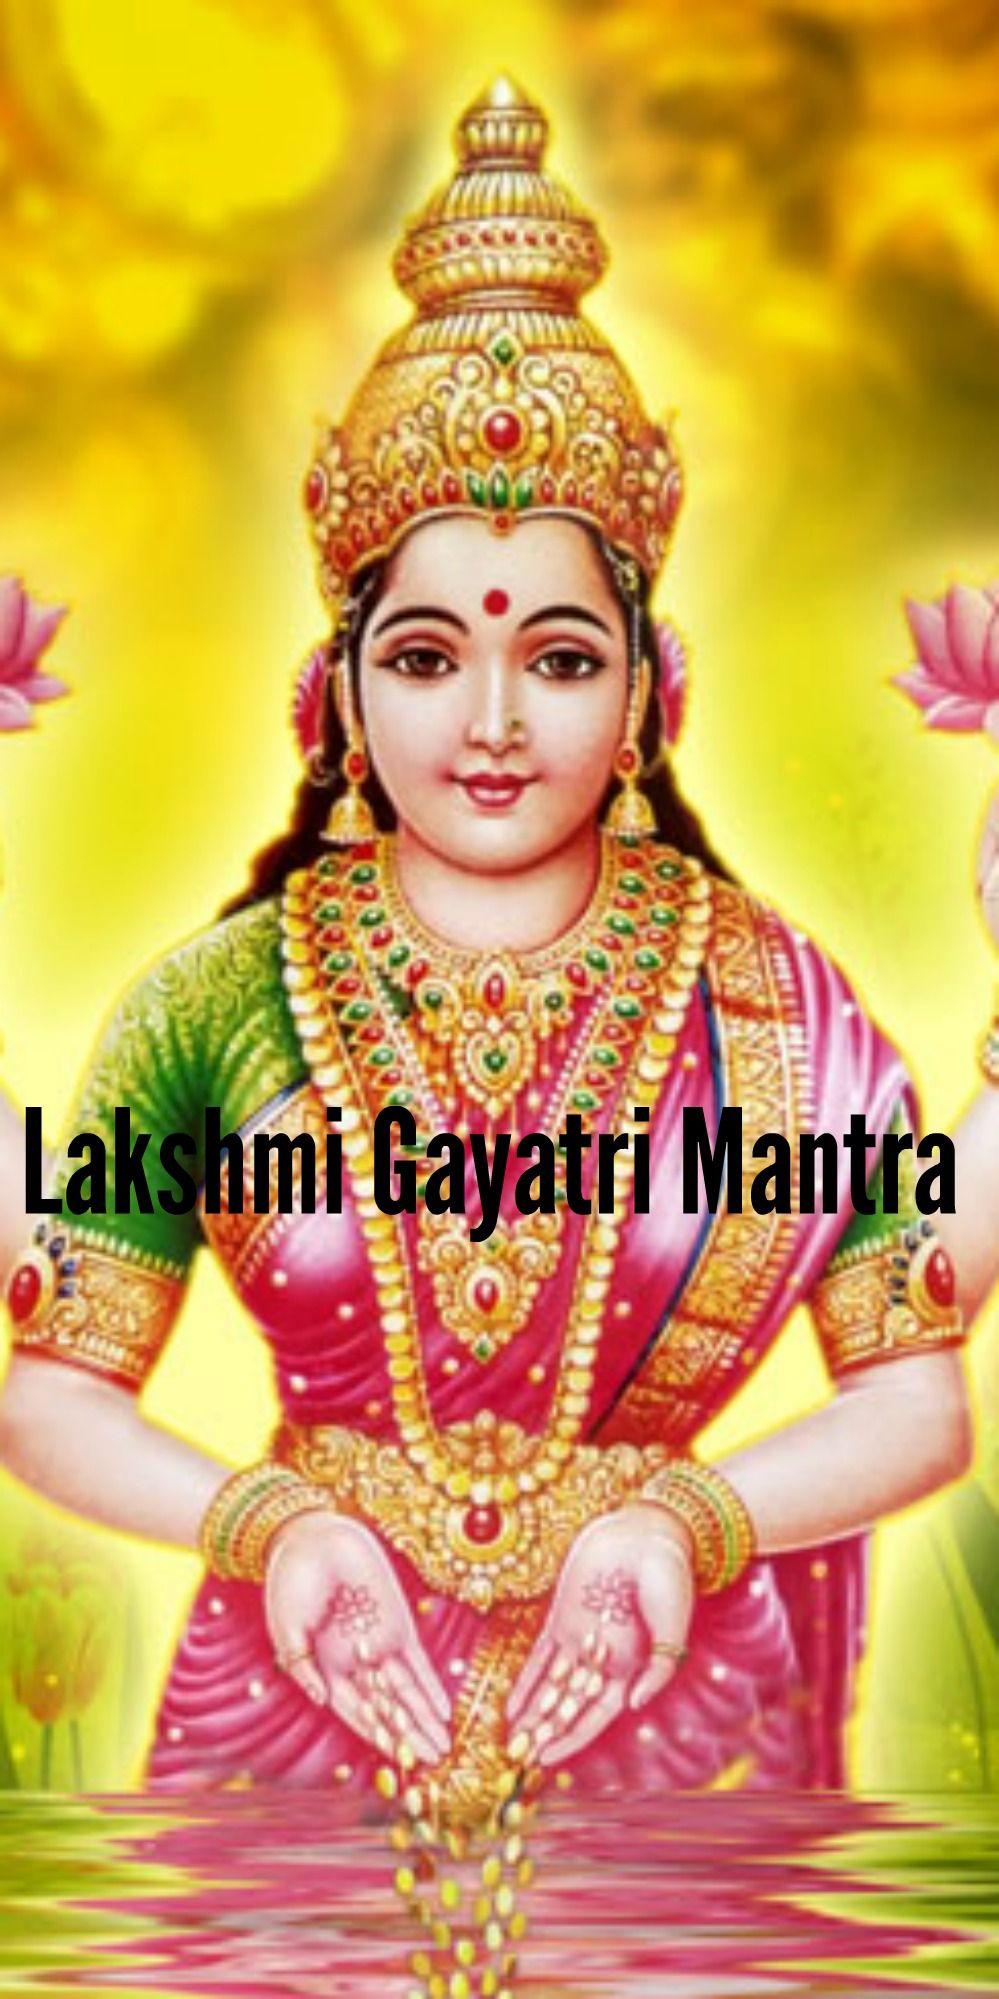 Lakshmi Gayatri Mantra: Lyrics, Meaning and Benefits